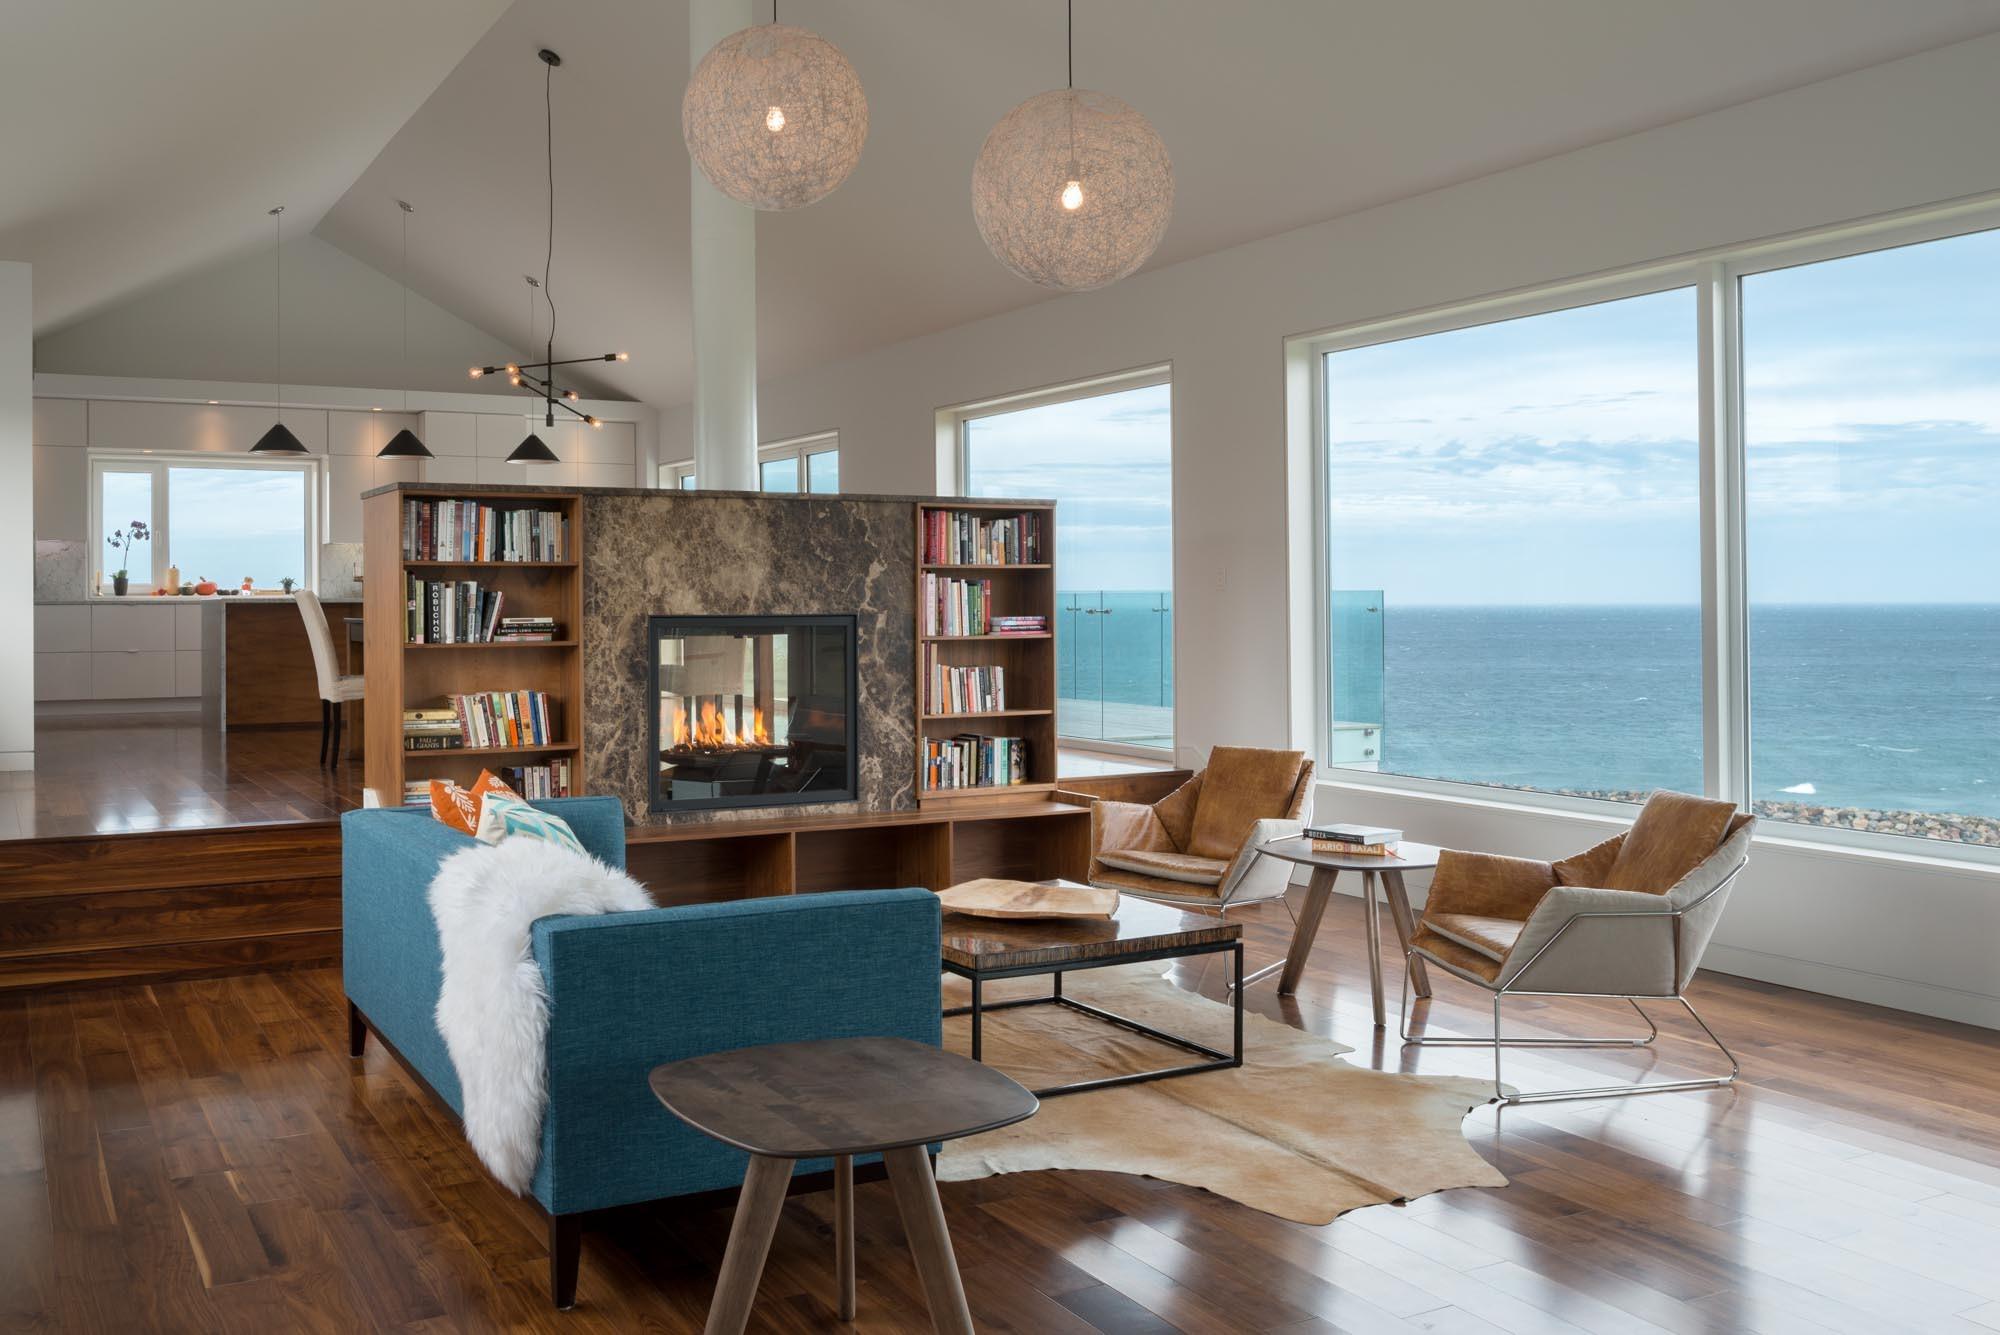 gallery of harbour heights residence omar gandhi. Black Bedroom Furniture Sets. Home Design Ideas